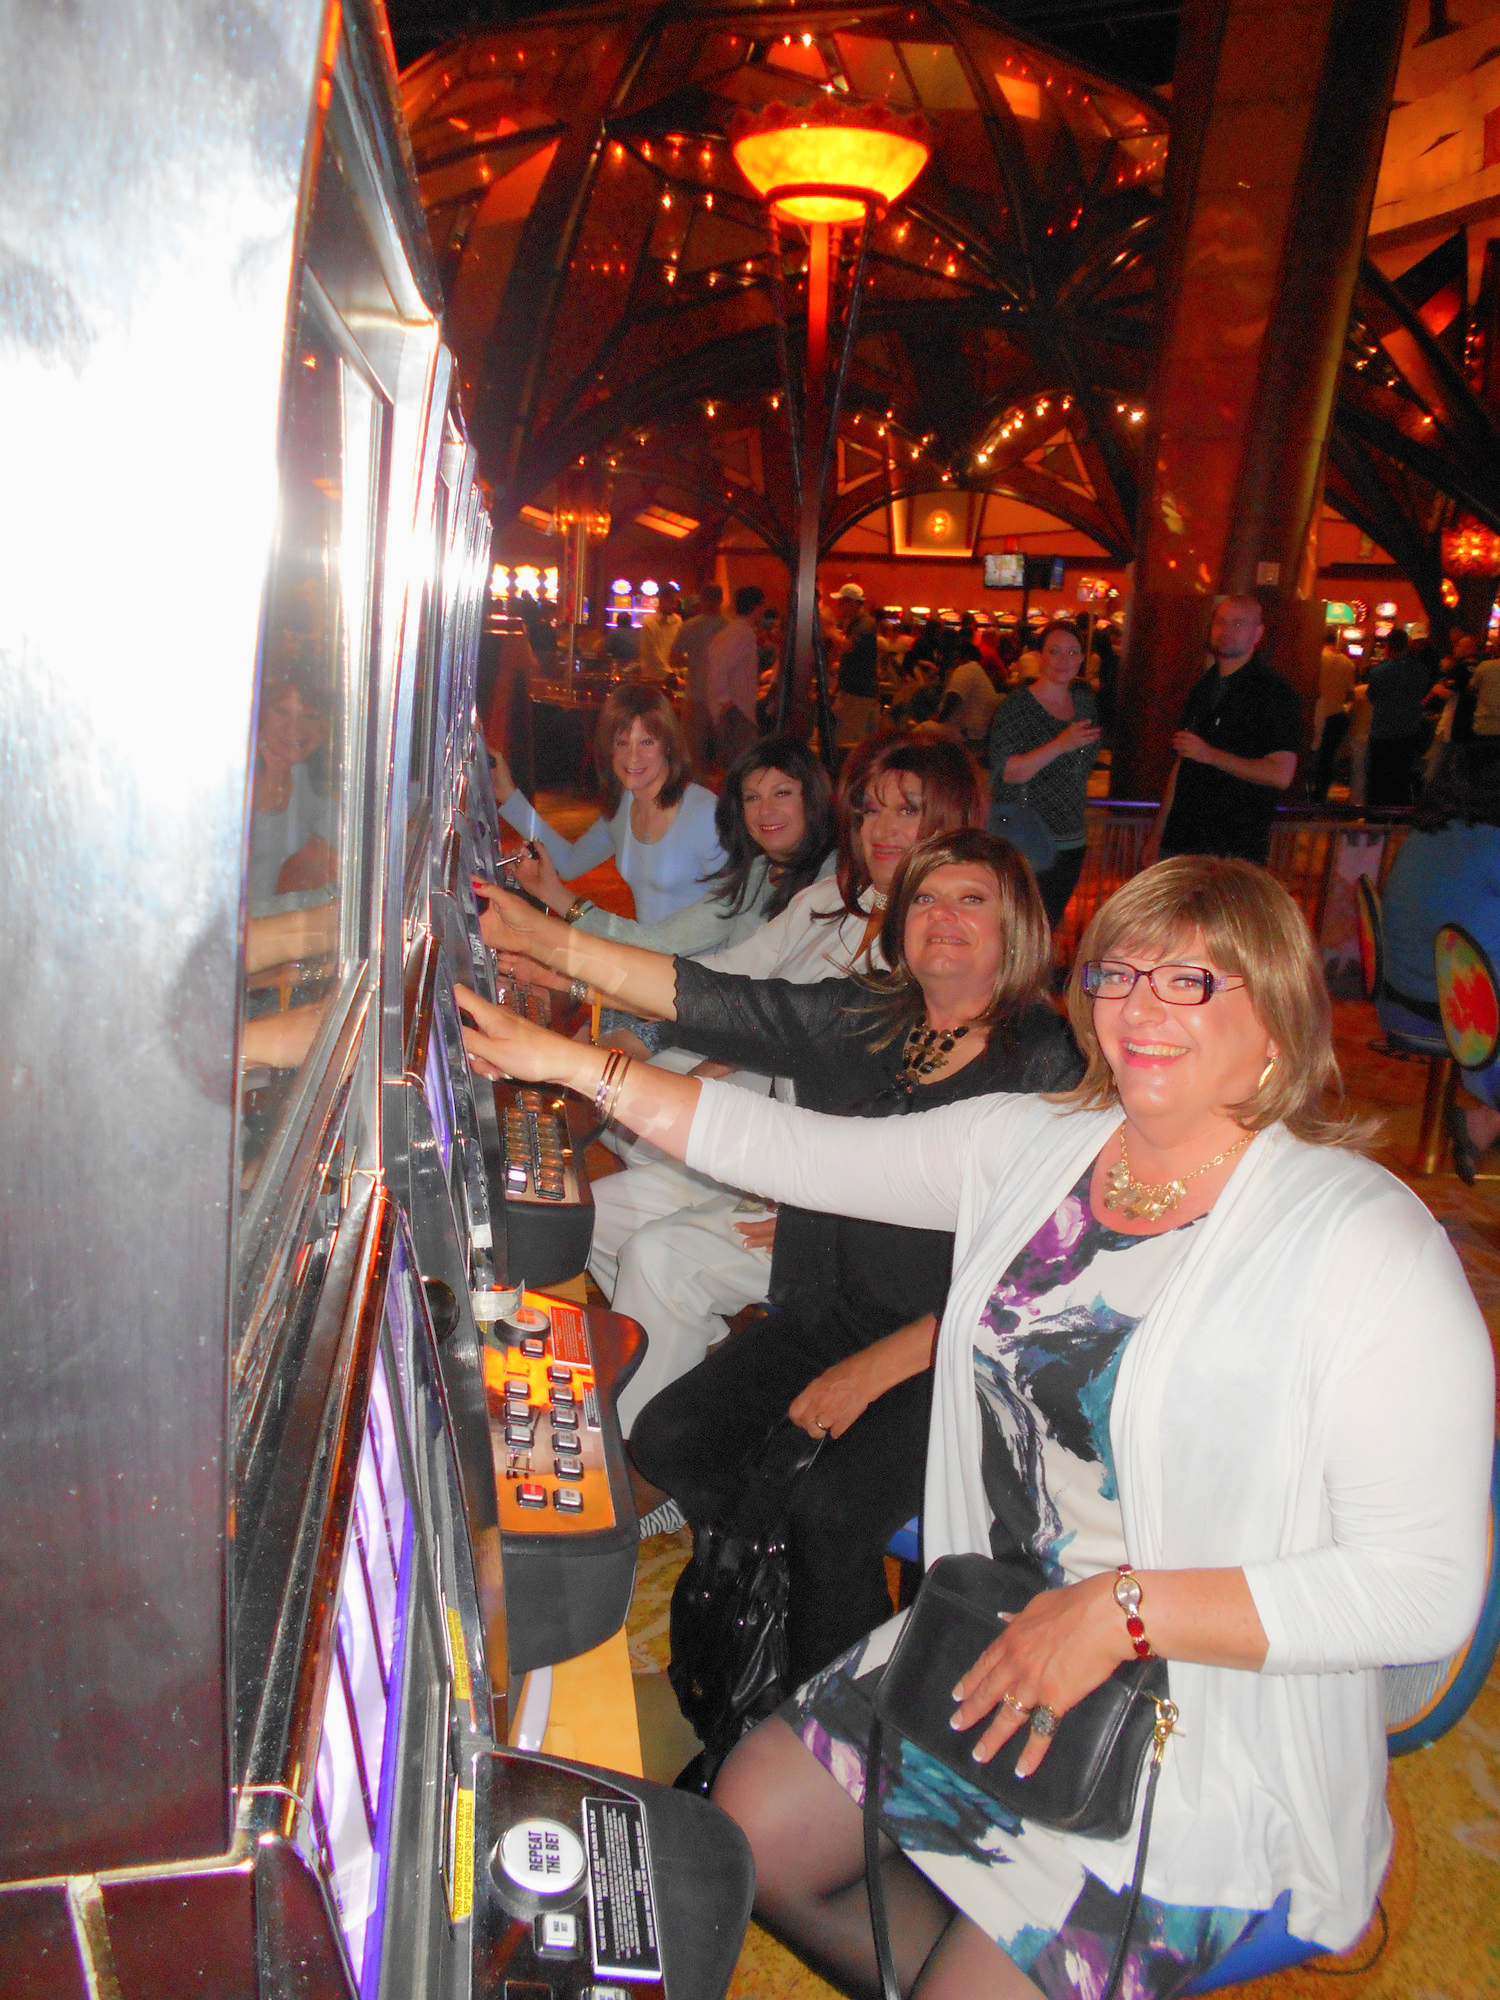 Synchronized Gambling